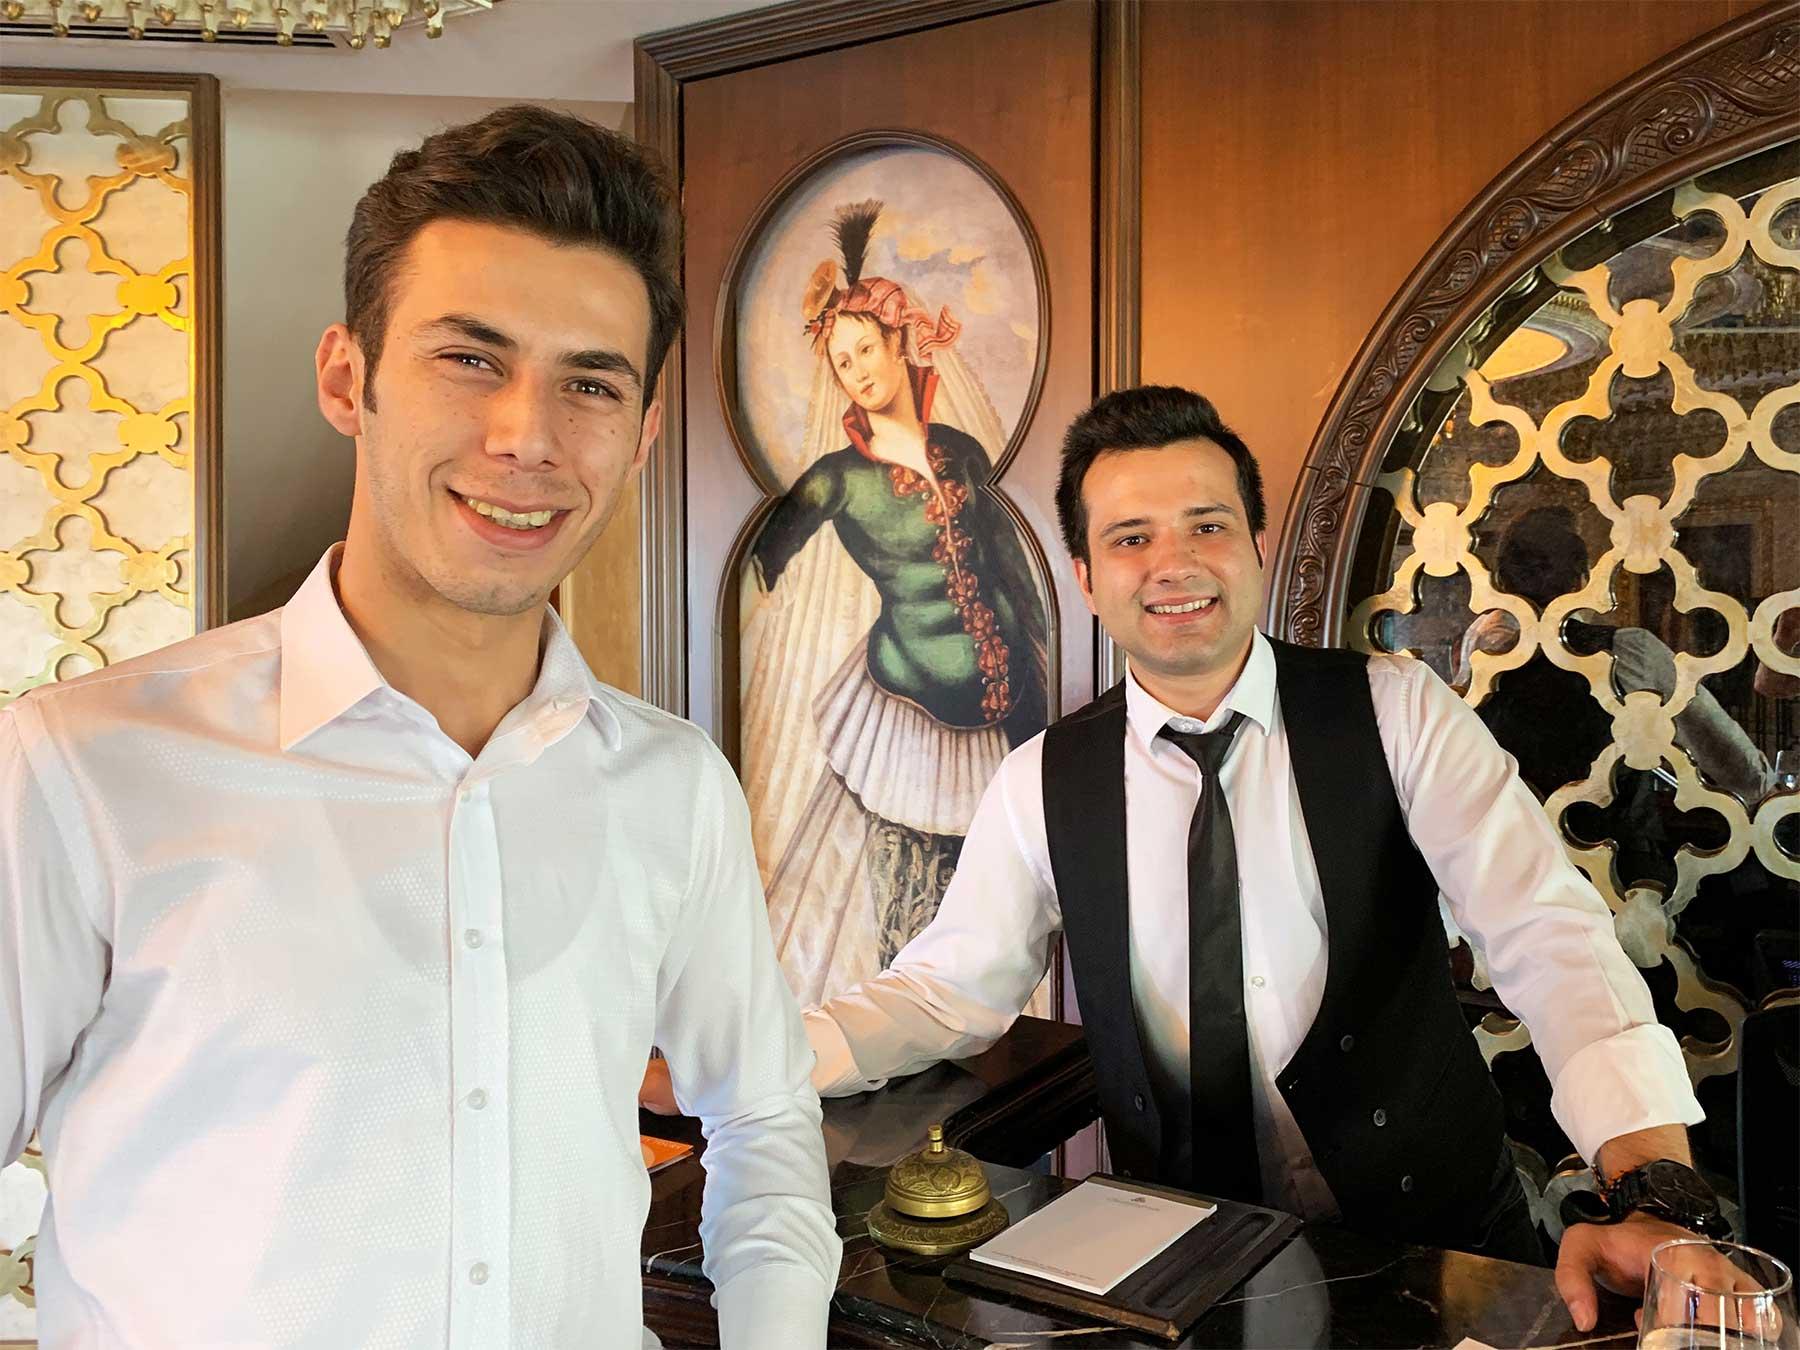 Daru Sultan Hotels Galata Istanbul Turkey | Seyit and Ugur | Dr Steven A Marin 2019 | Istanbul Learning Adventure